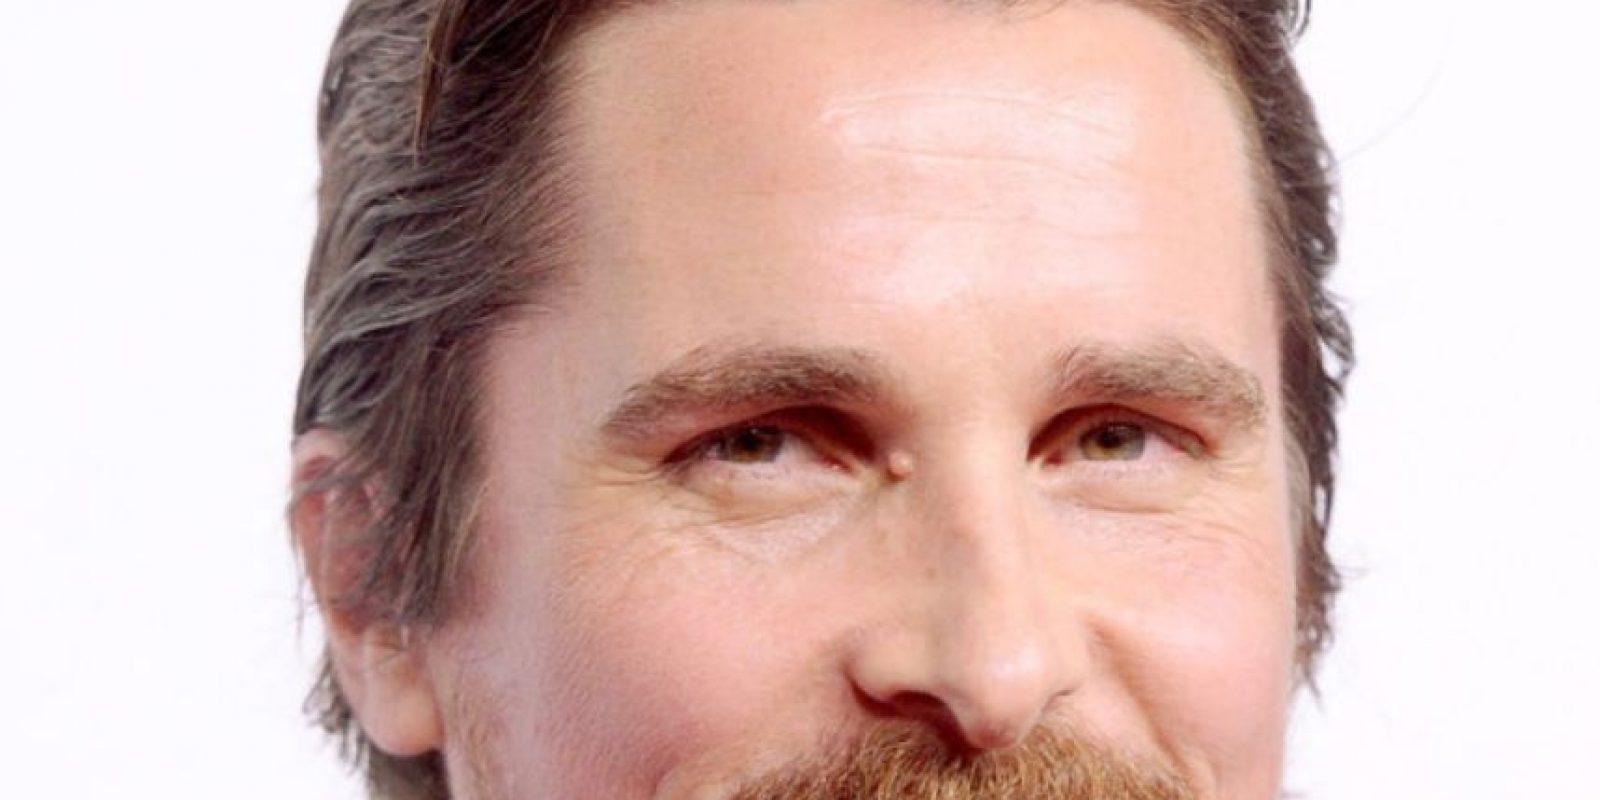 Christian Bale ya la usaba antes de que se pusiera de moda. Foto:Getty Images